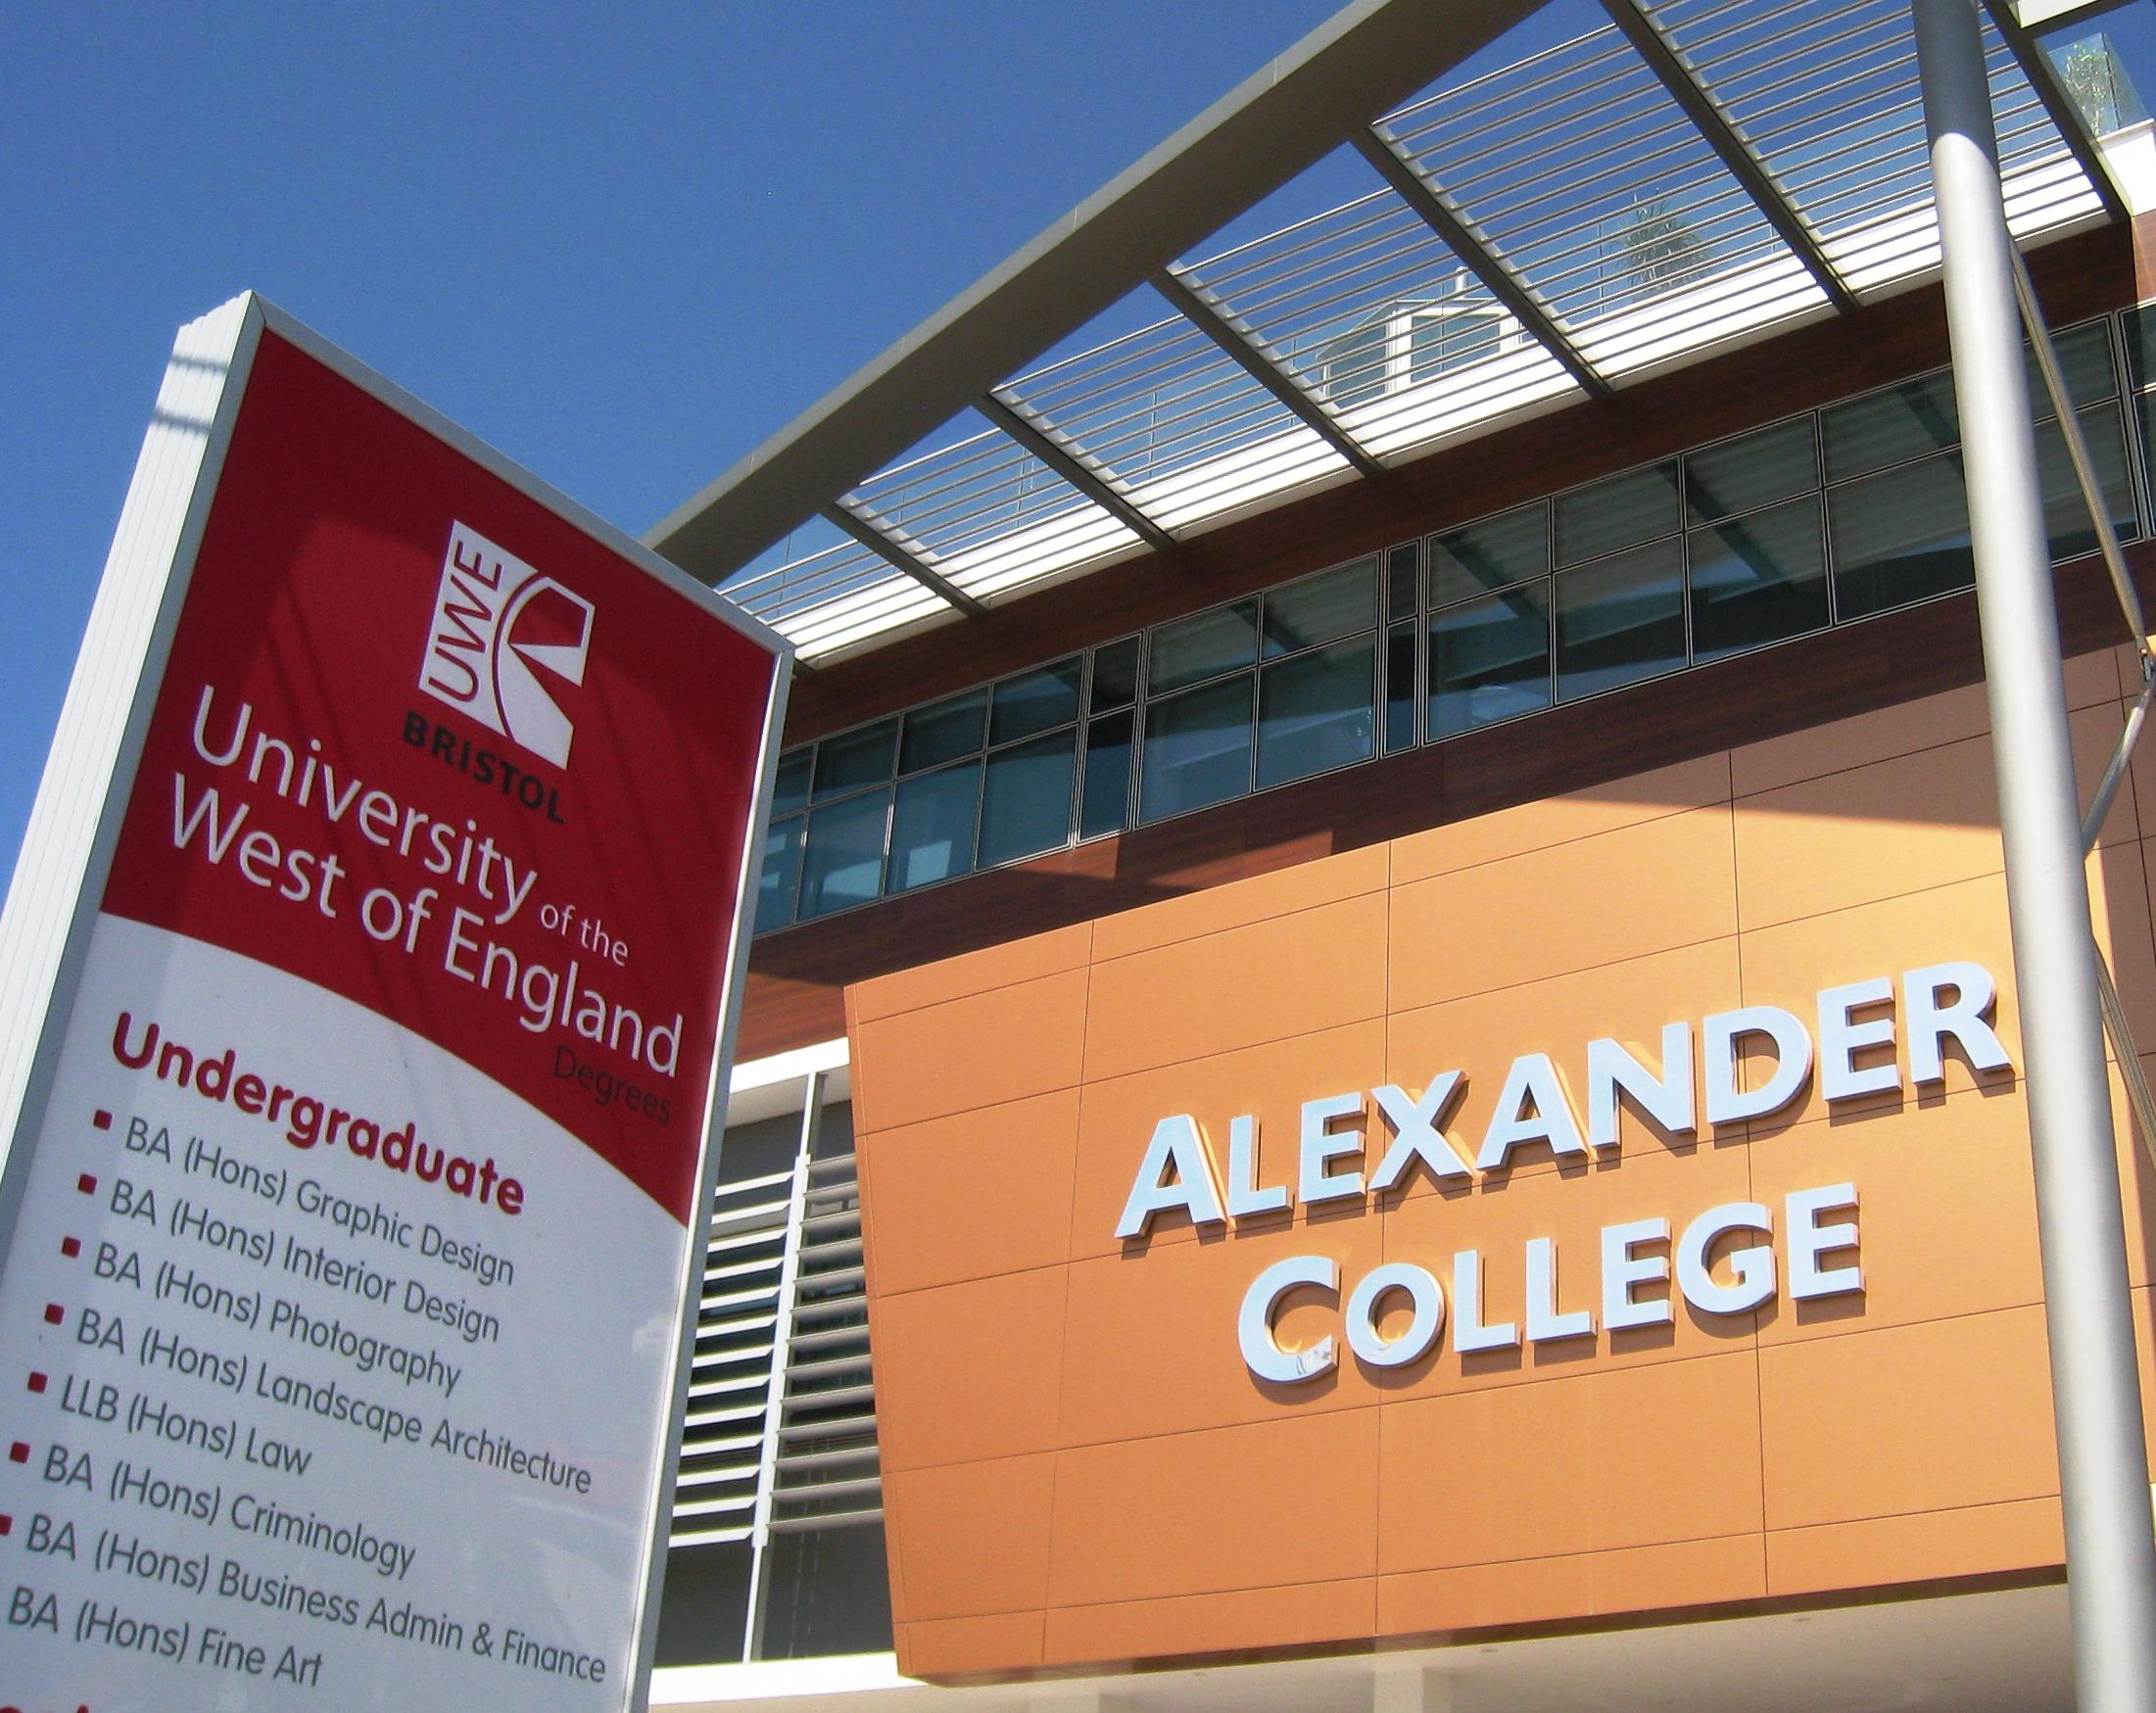 alexander-photo-for-anouncements.JPG